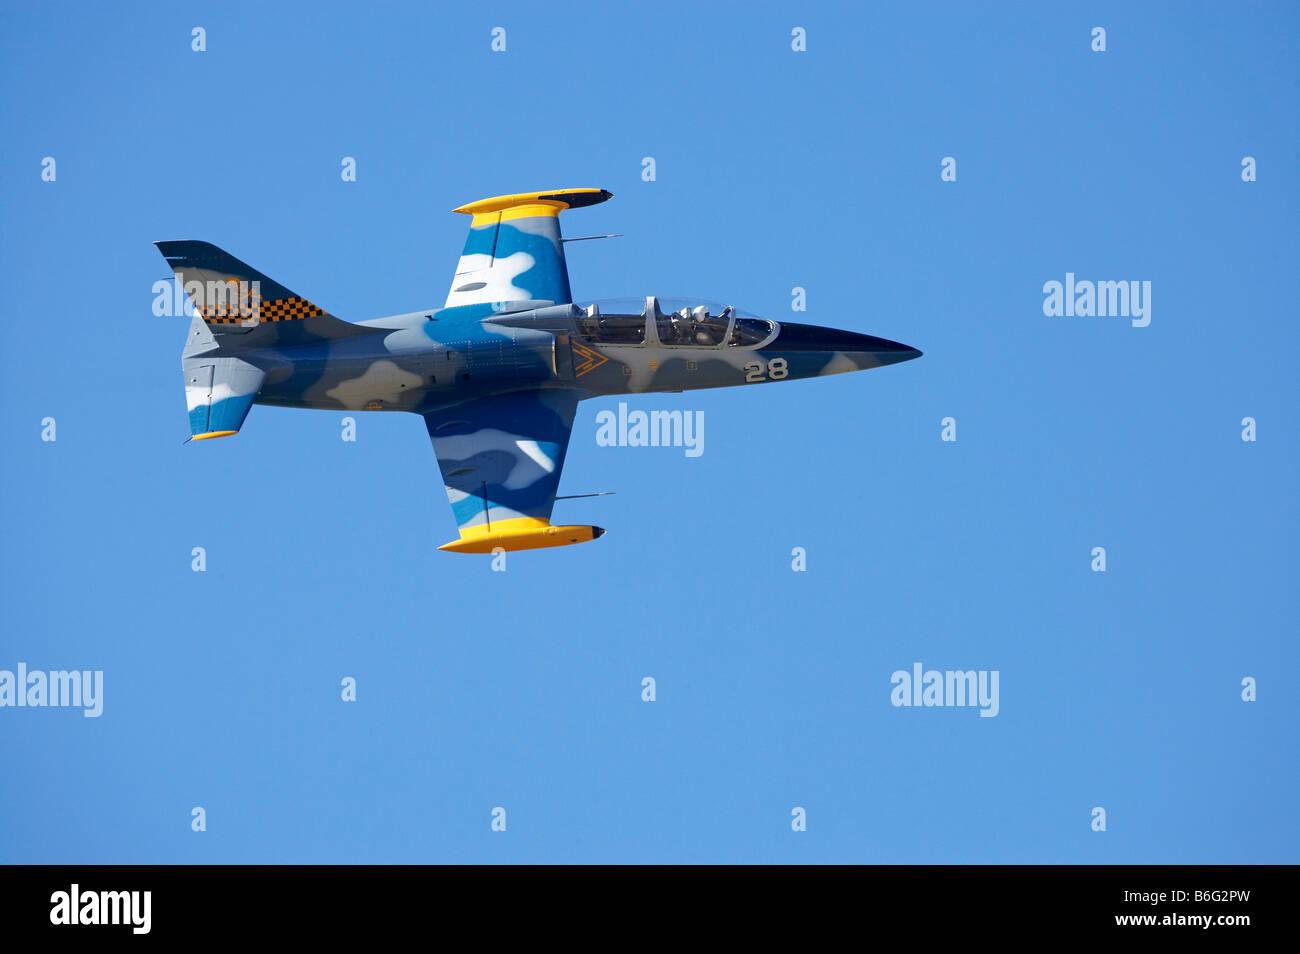 Czechoslovakian L 39 Albatros Jet Fighter - Stock Image